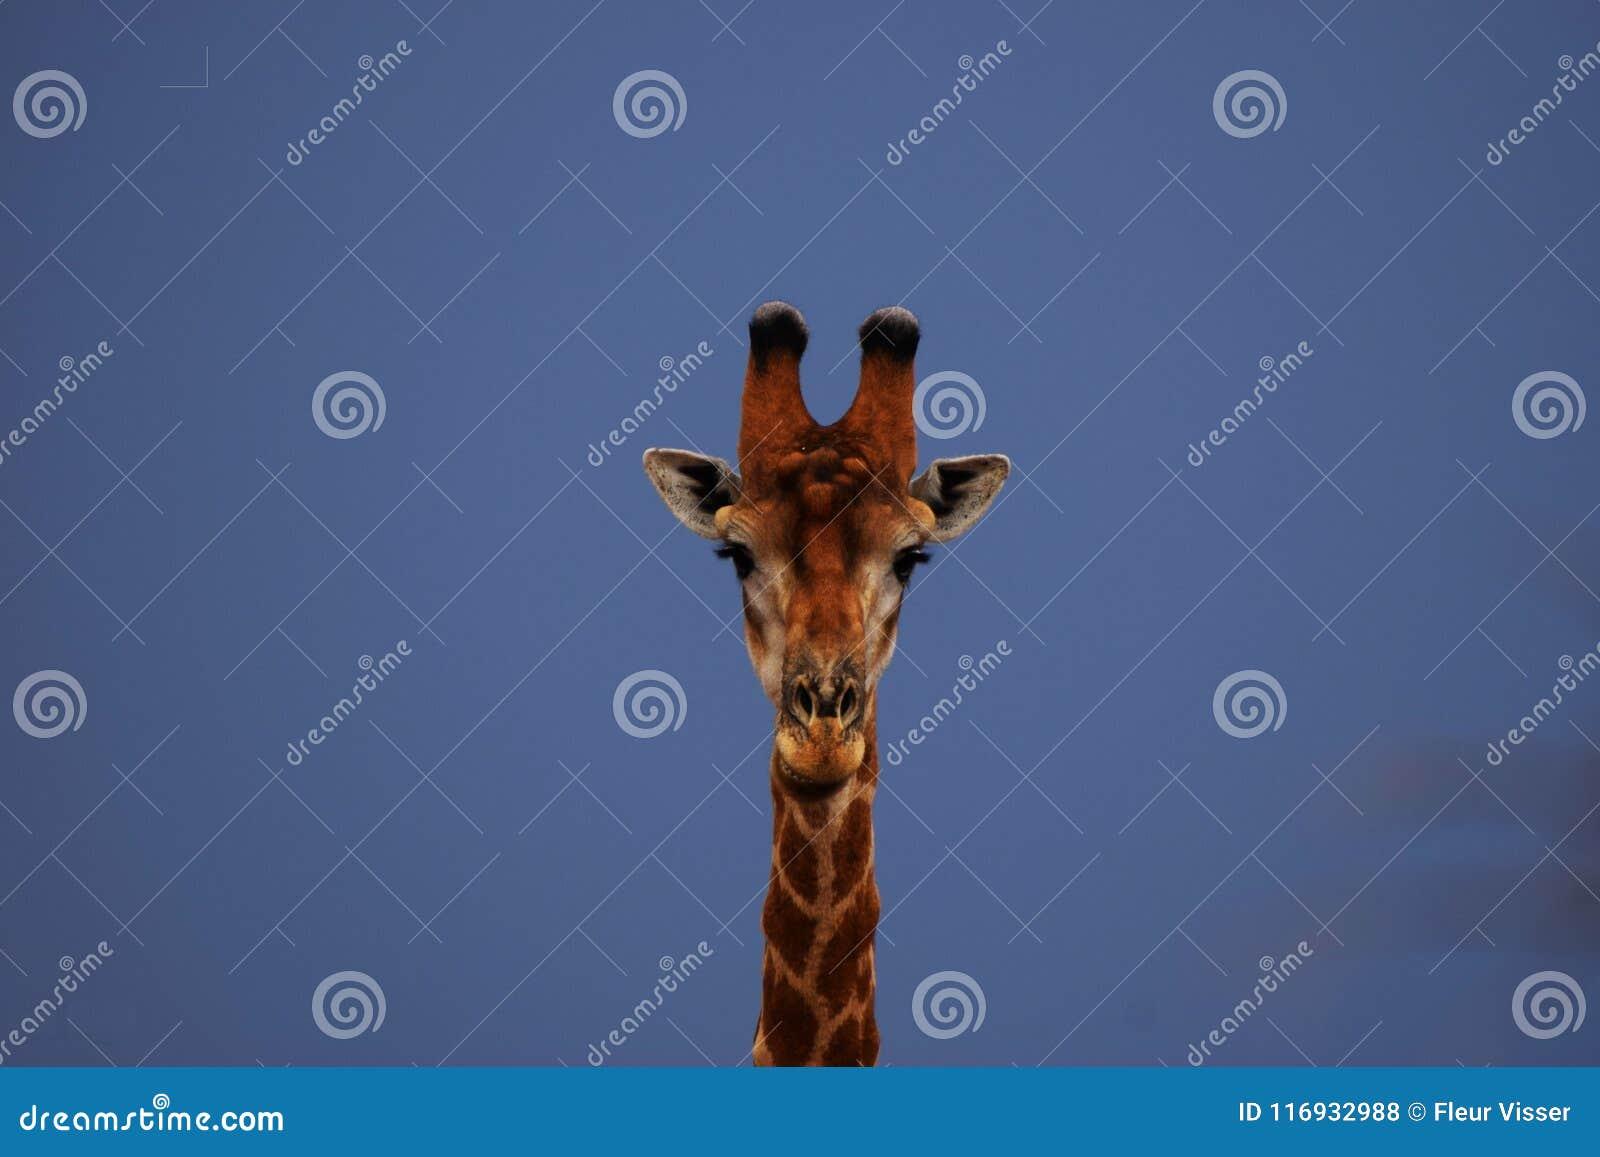 Giraffstående, Limpopo